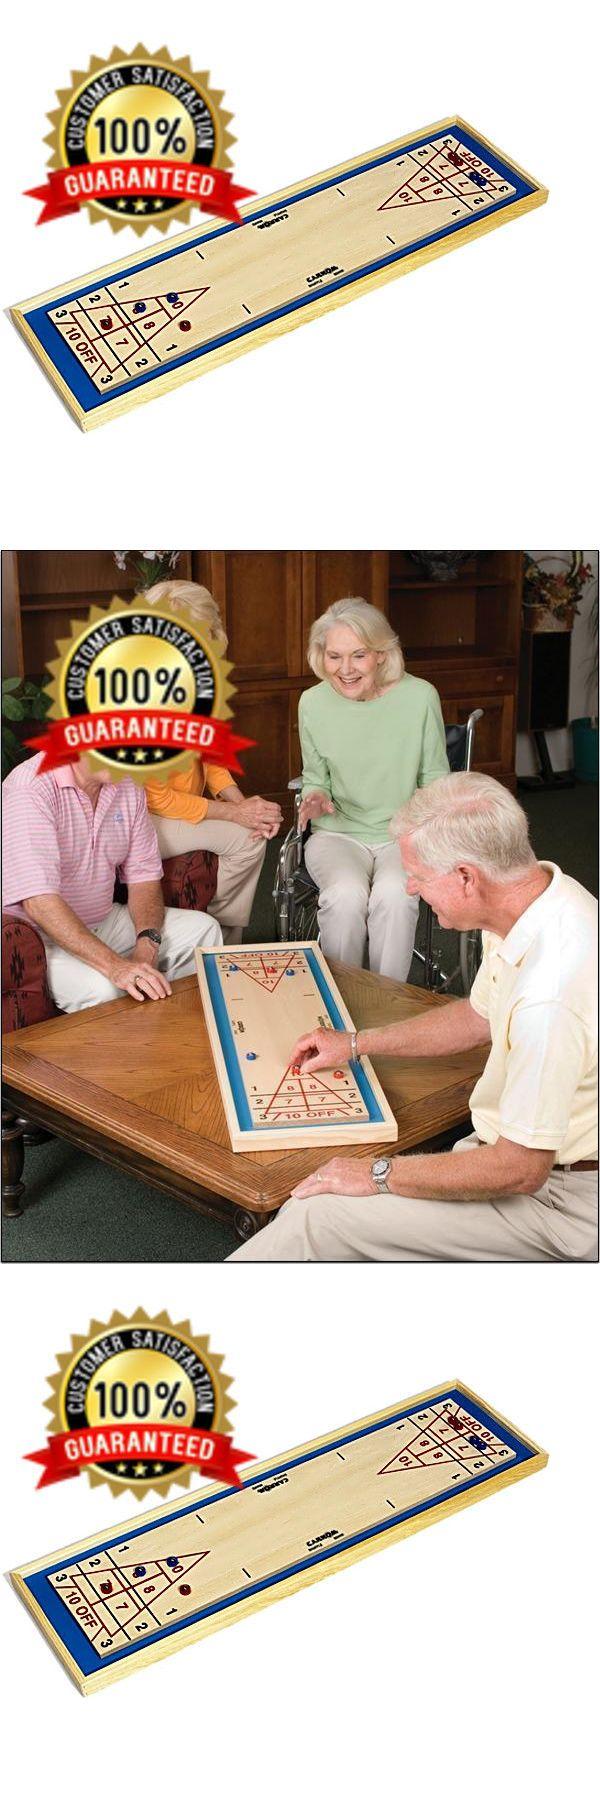 Shuffleboard 79777: Carrom Shuffleboard Game -> BUY IT NOW ONLY: $58.15 on eBay!